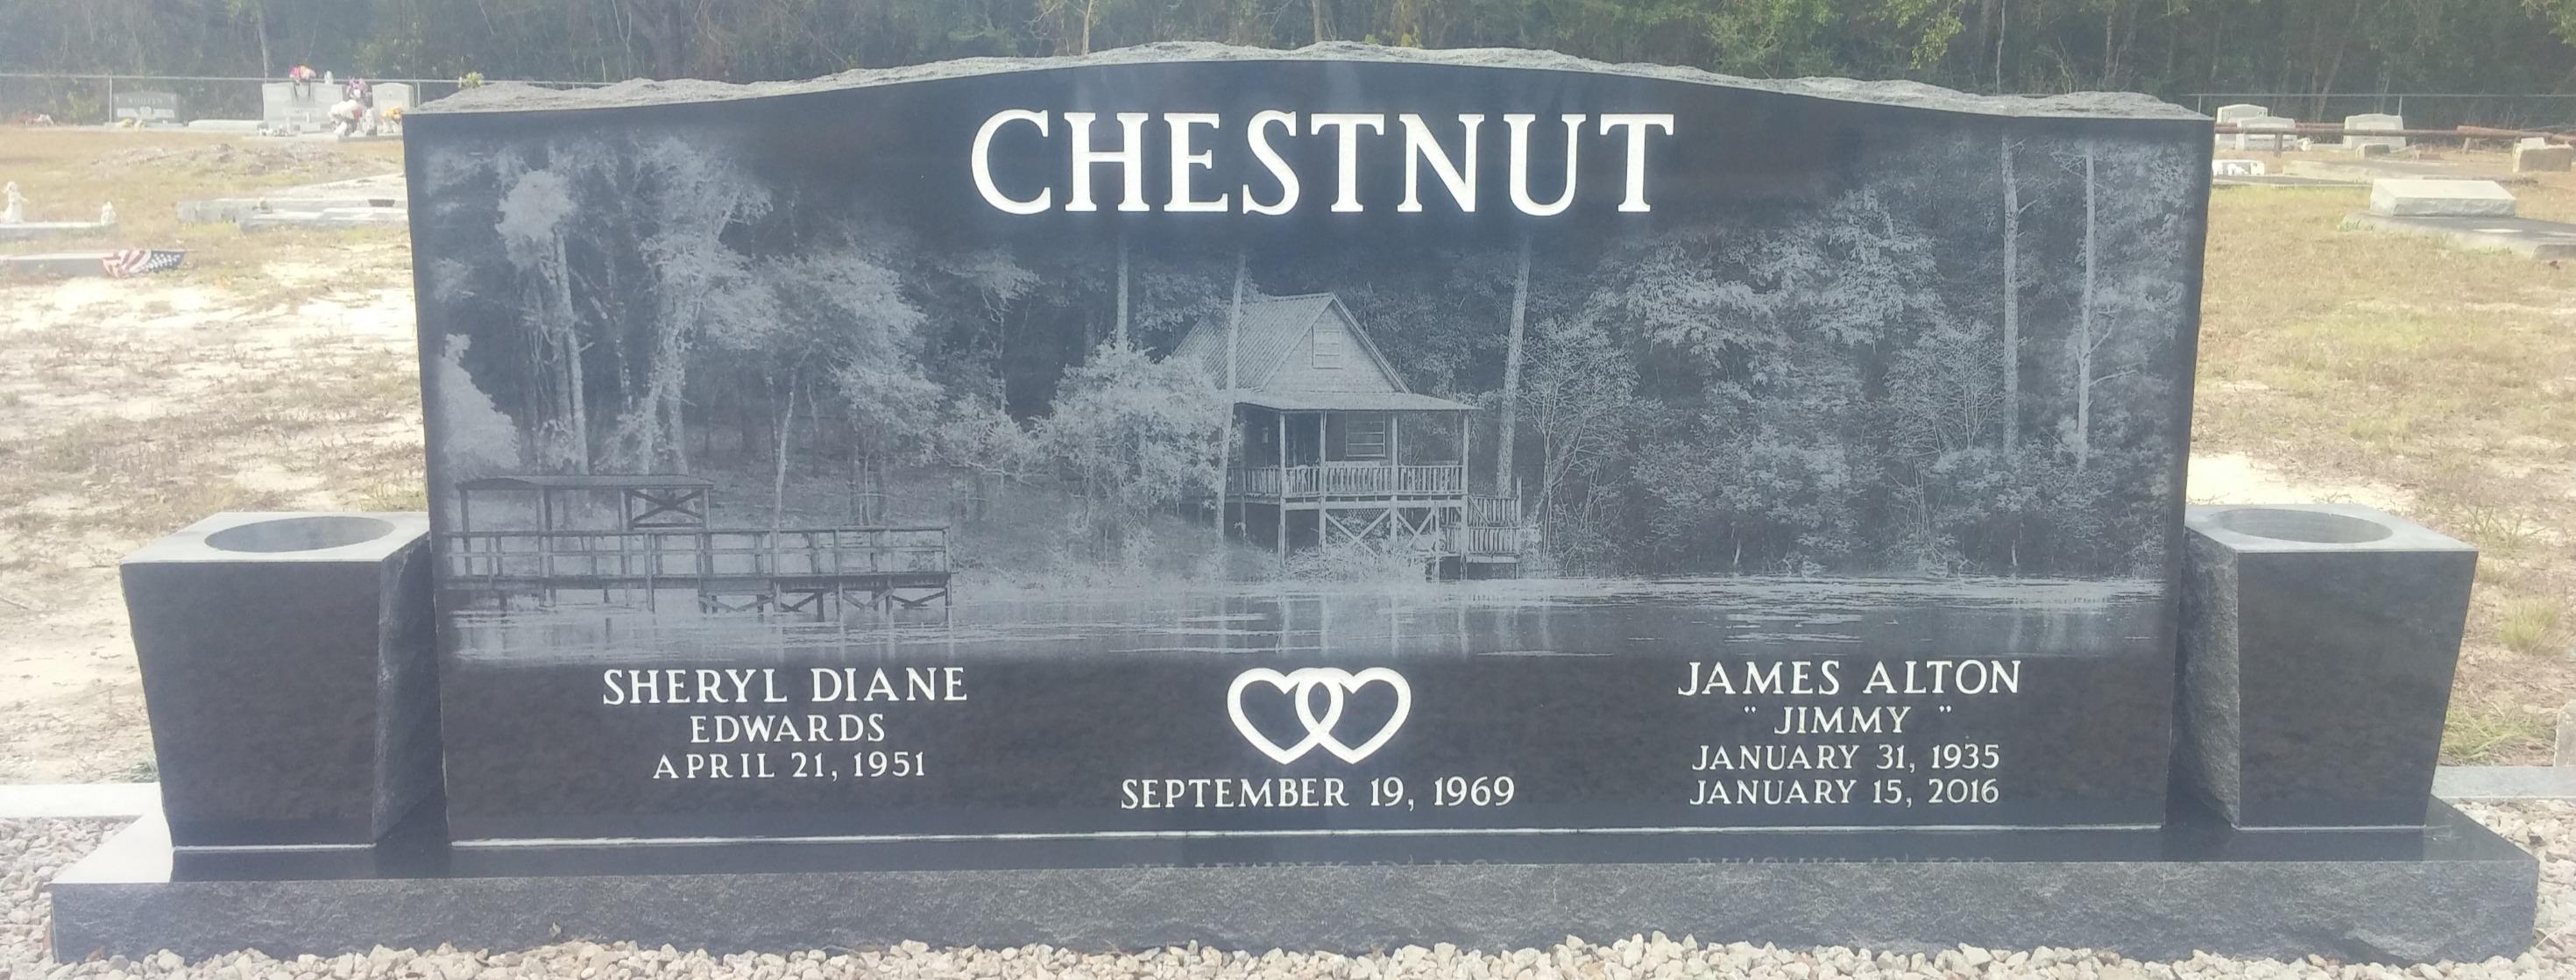 Chestnut_edited